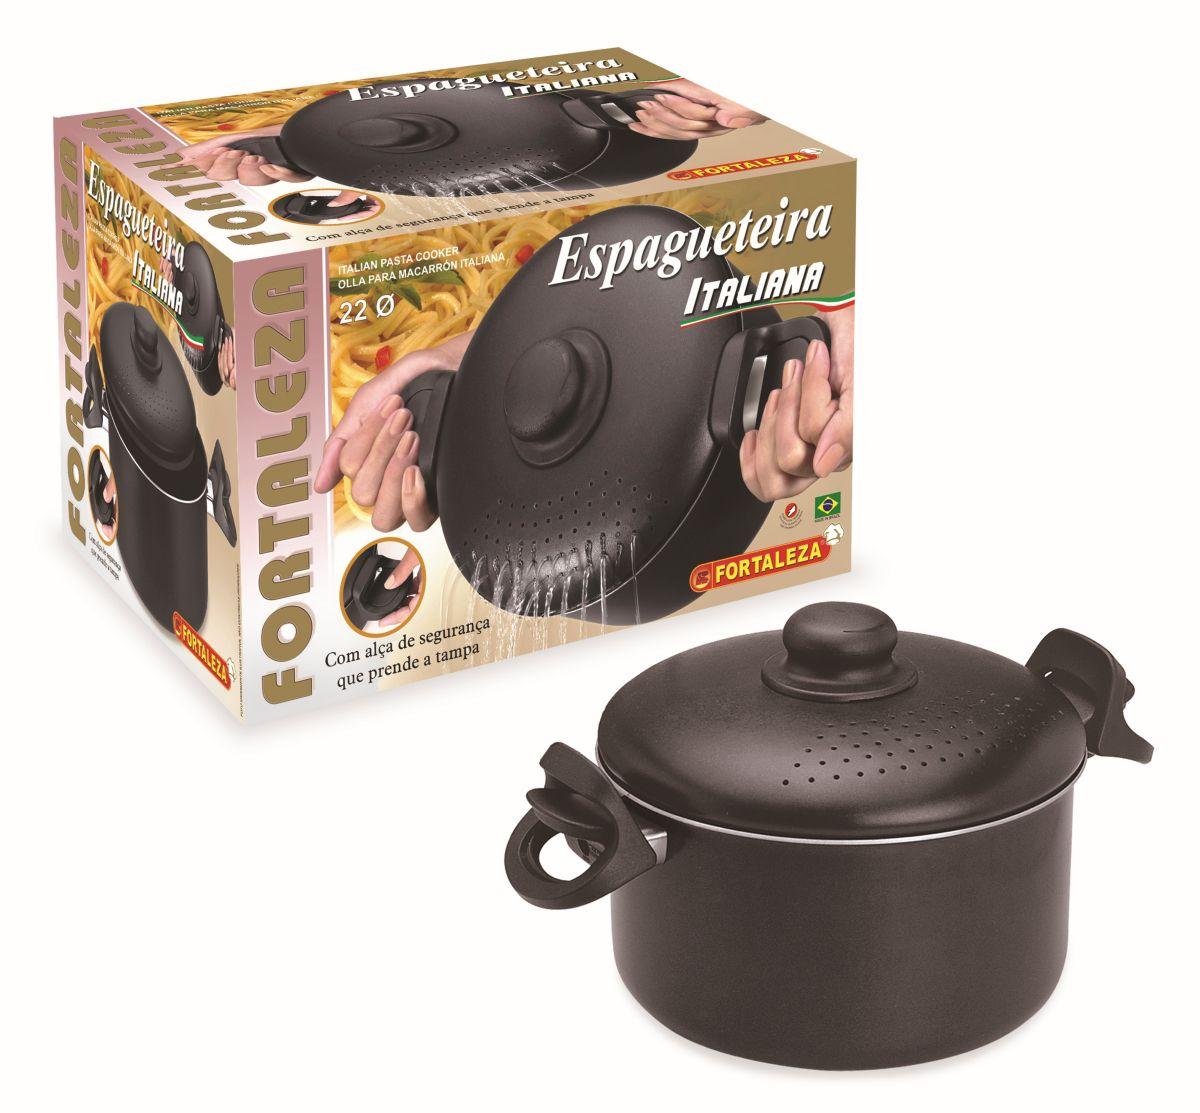 Espagueteira Italianíssima 22